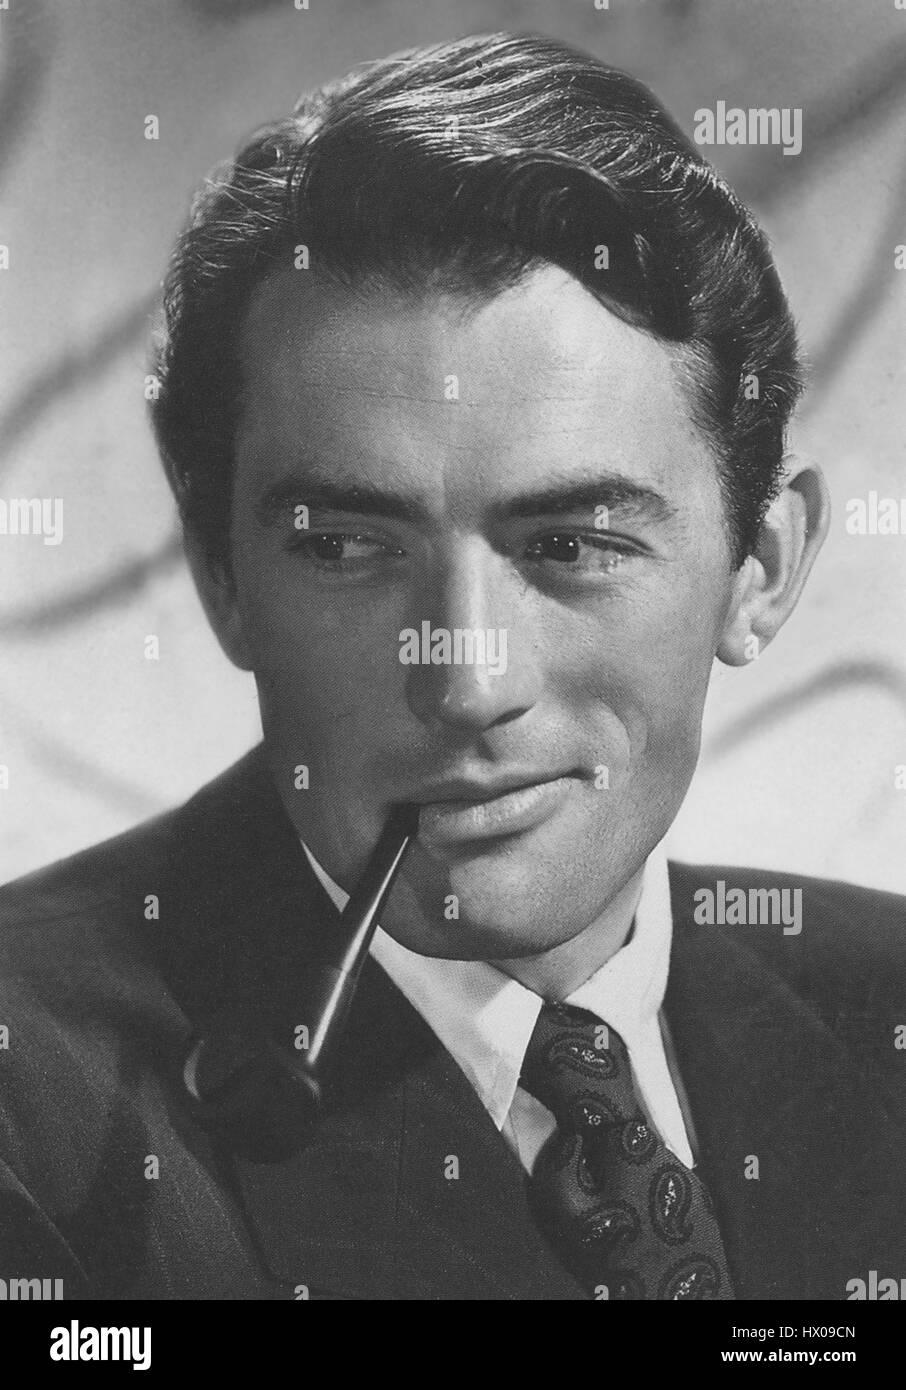 Gregory Peck, Werbung Portrait, 1951 Stockbild